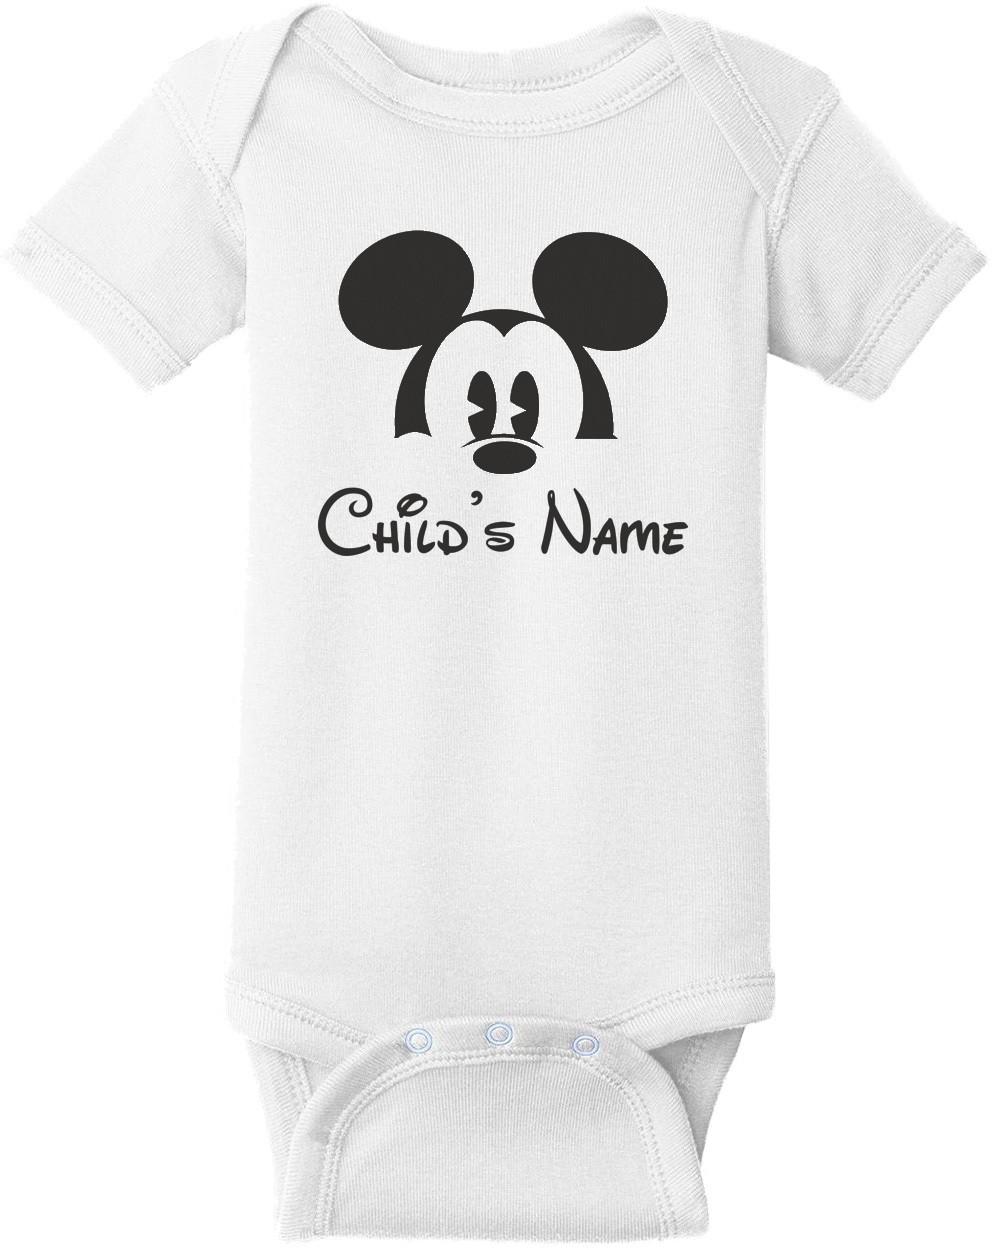 Disney Family Group Shirts - Mickey Child's Name - Disney T-Shirt